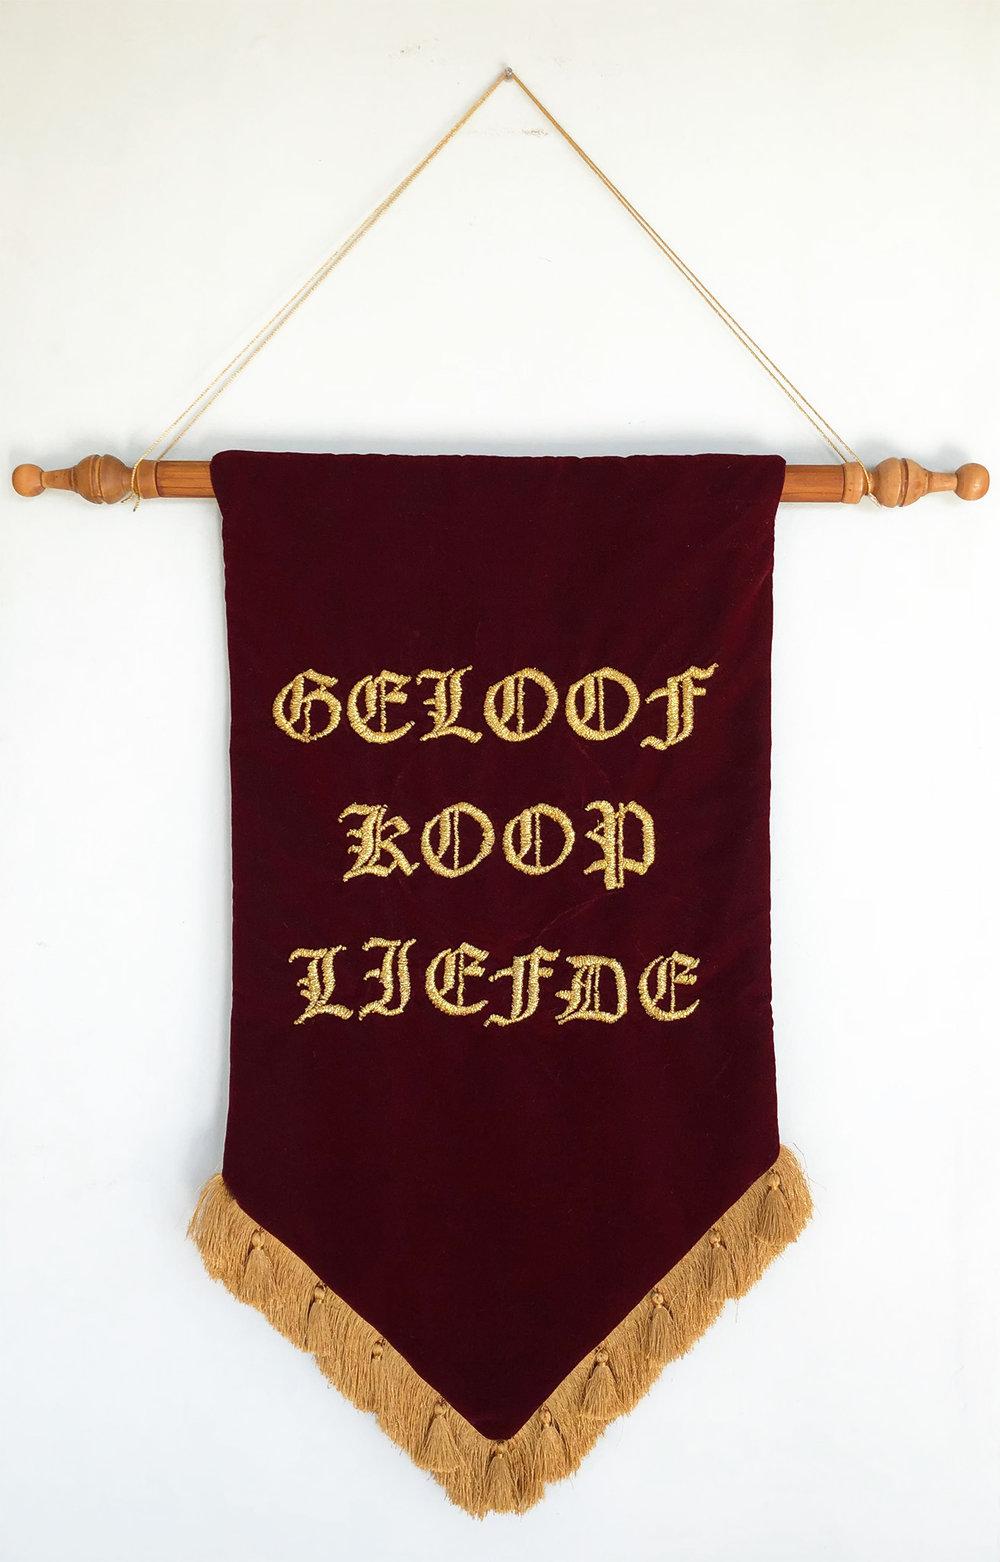 Kanselkleed (Pulpit Banner)